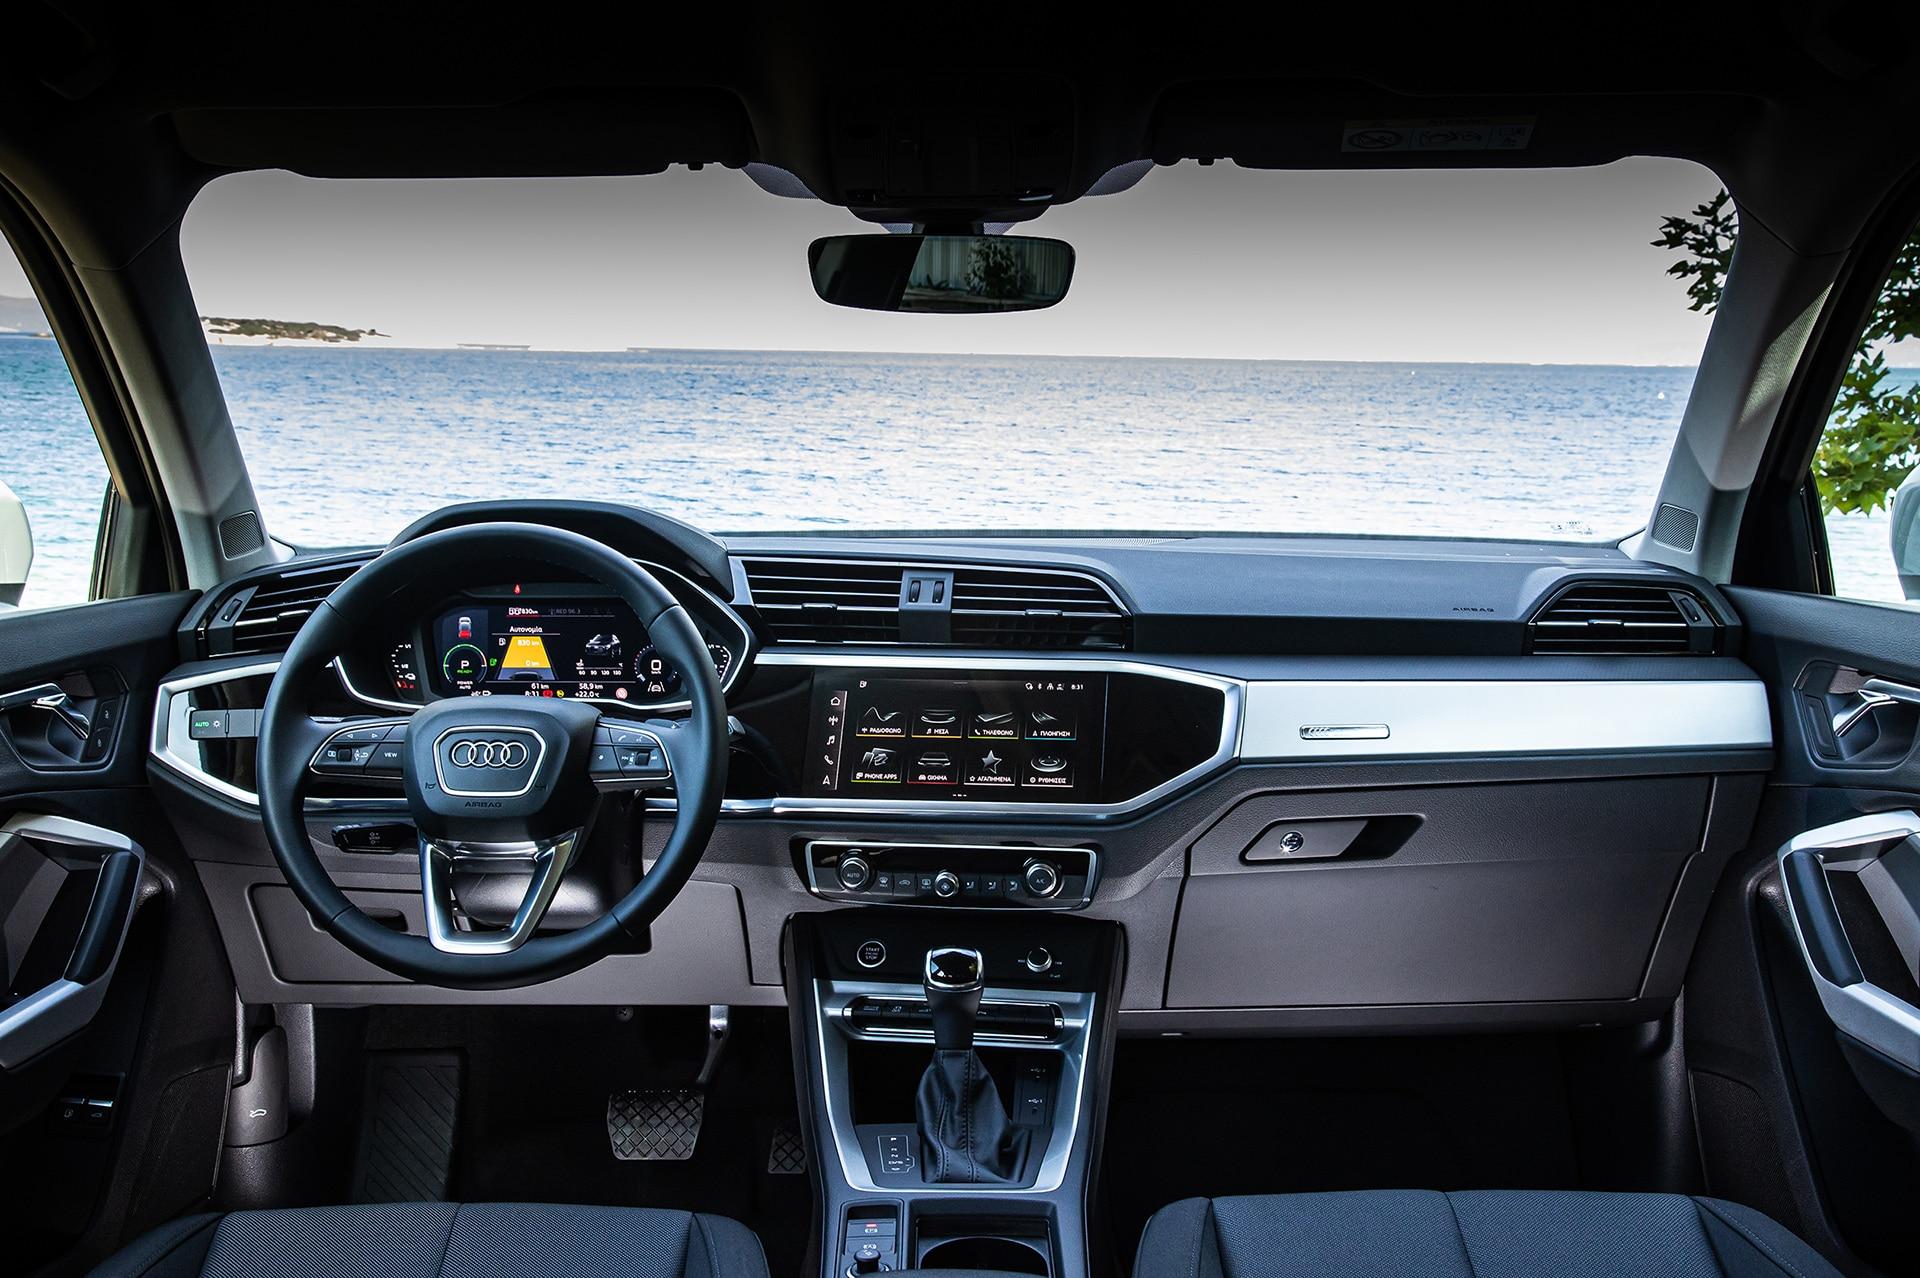 AUDI Q3 TFSI e 44 Αυτά είναι τα plug-in hybrid Audi Q3 TFSI e & Q3 Sportback TFSI e Audi, Audi Q3, Hybrid, plug-in hybrid, Q3, ειδήσεις, Νέα, υβριδικό